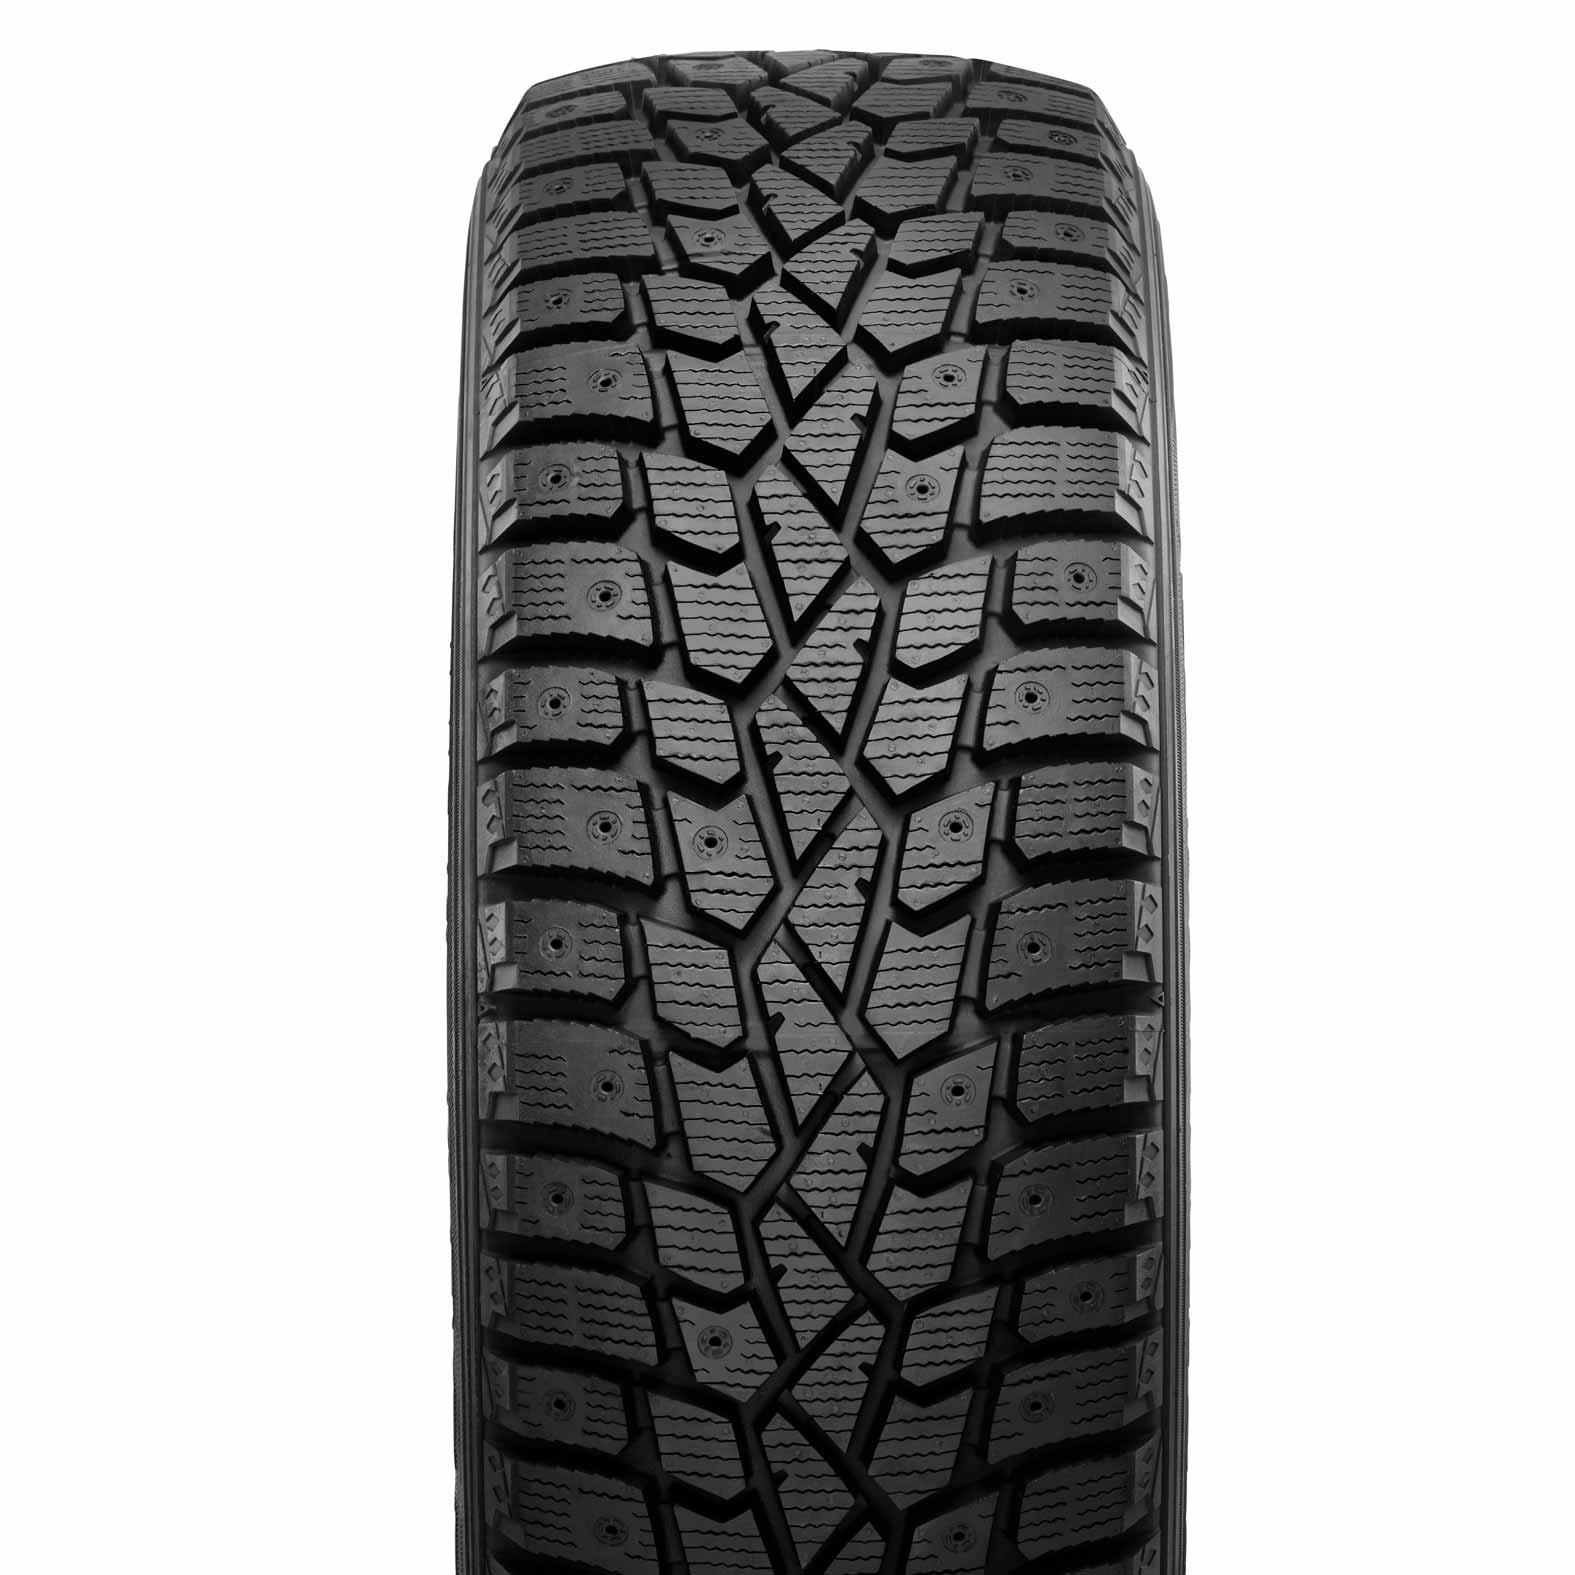 215//50R17 91T Sumitomo Ice Edge Studable-Winter Radial Tire